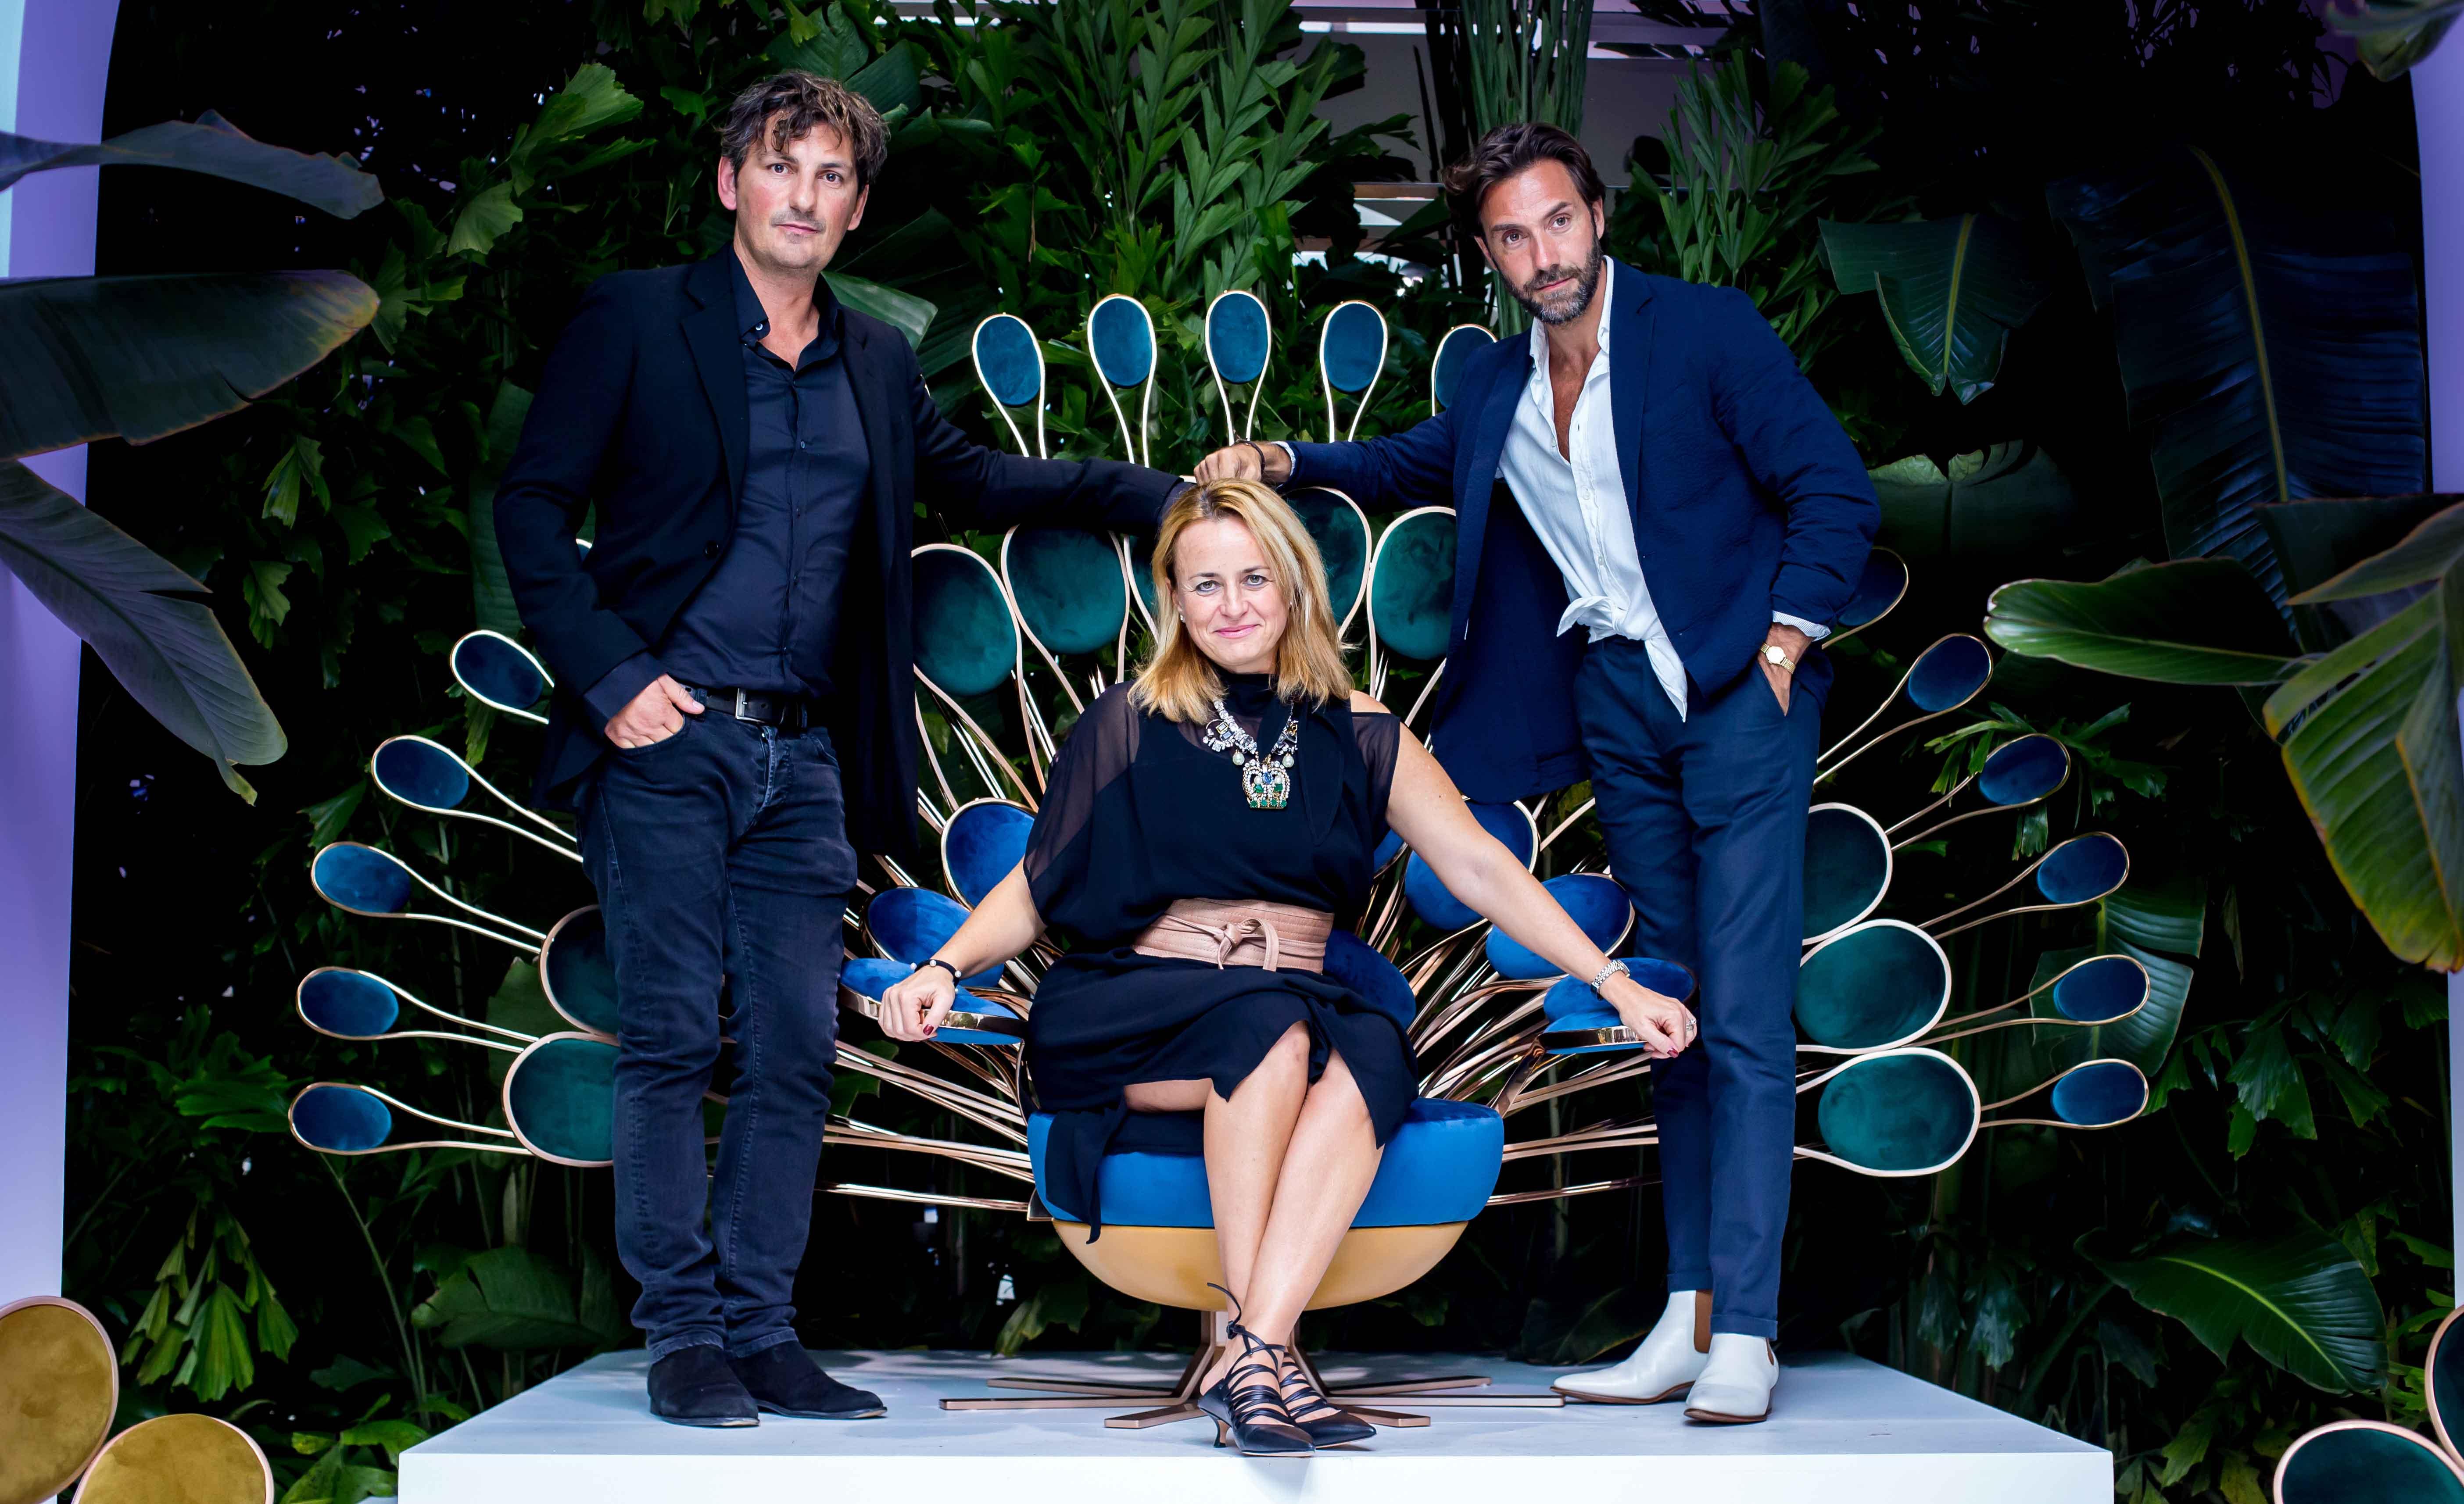 Marco Morandini, Eleonore Cavalli and Marc Ange